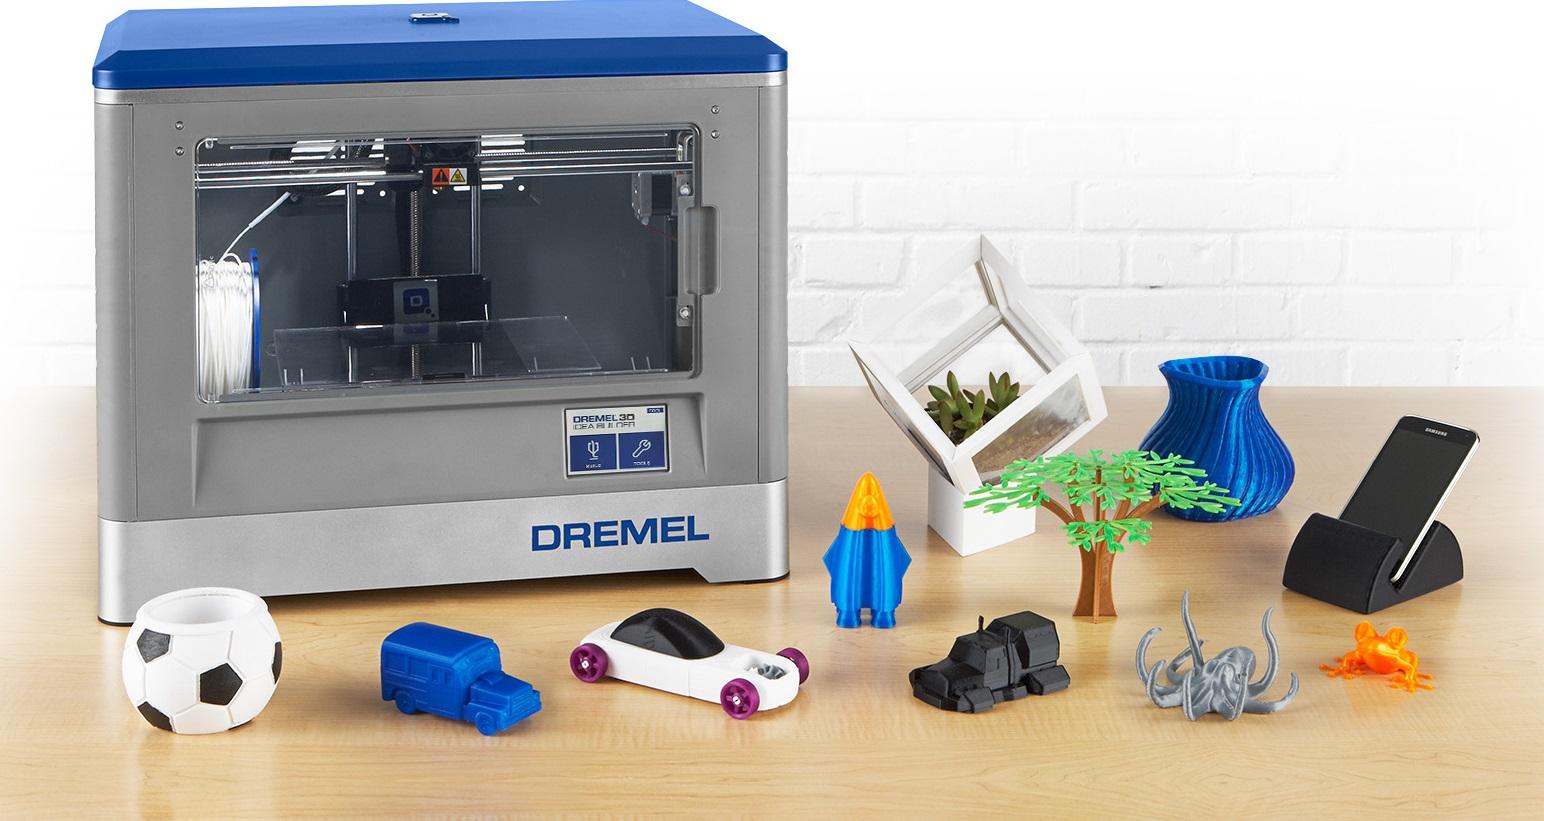 printer 3D price فناوری چاپگرهای سهبعدی